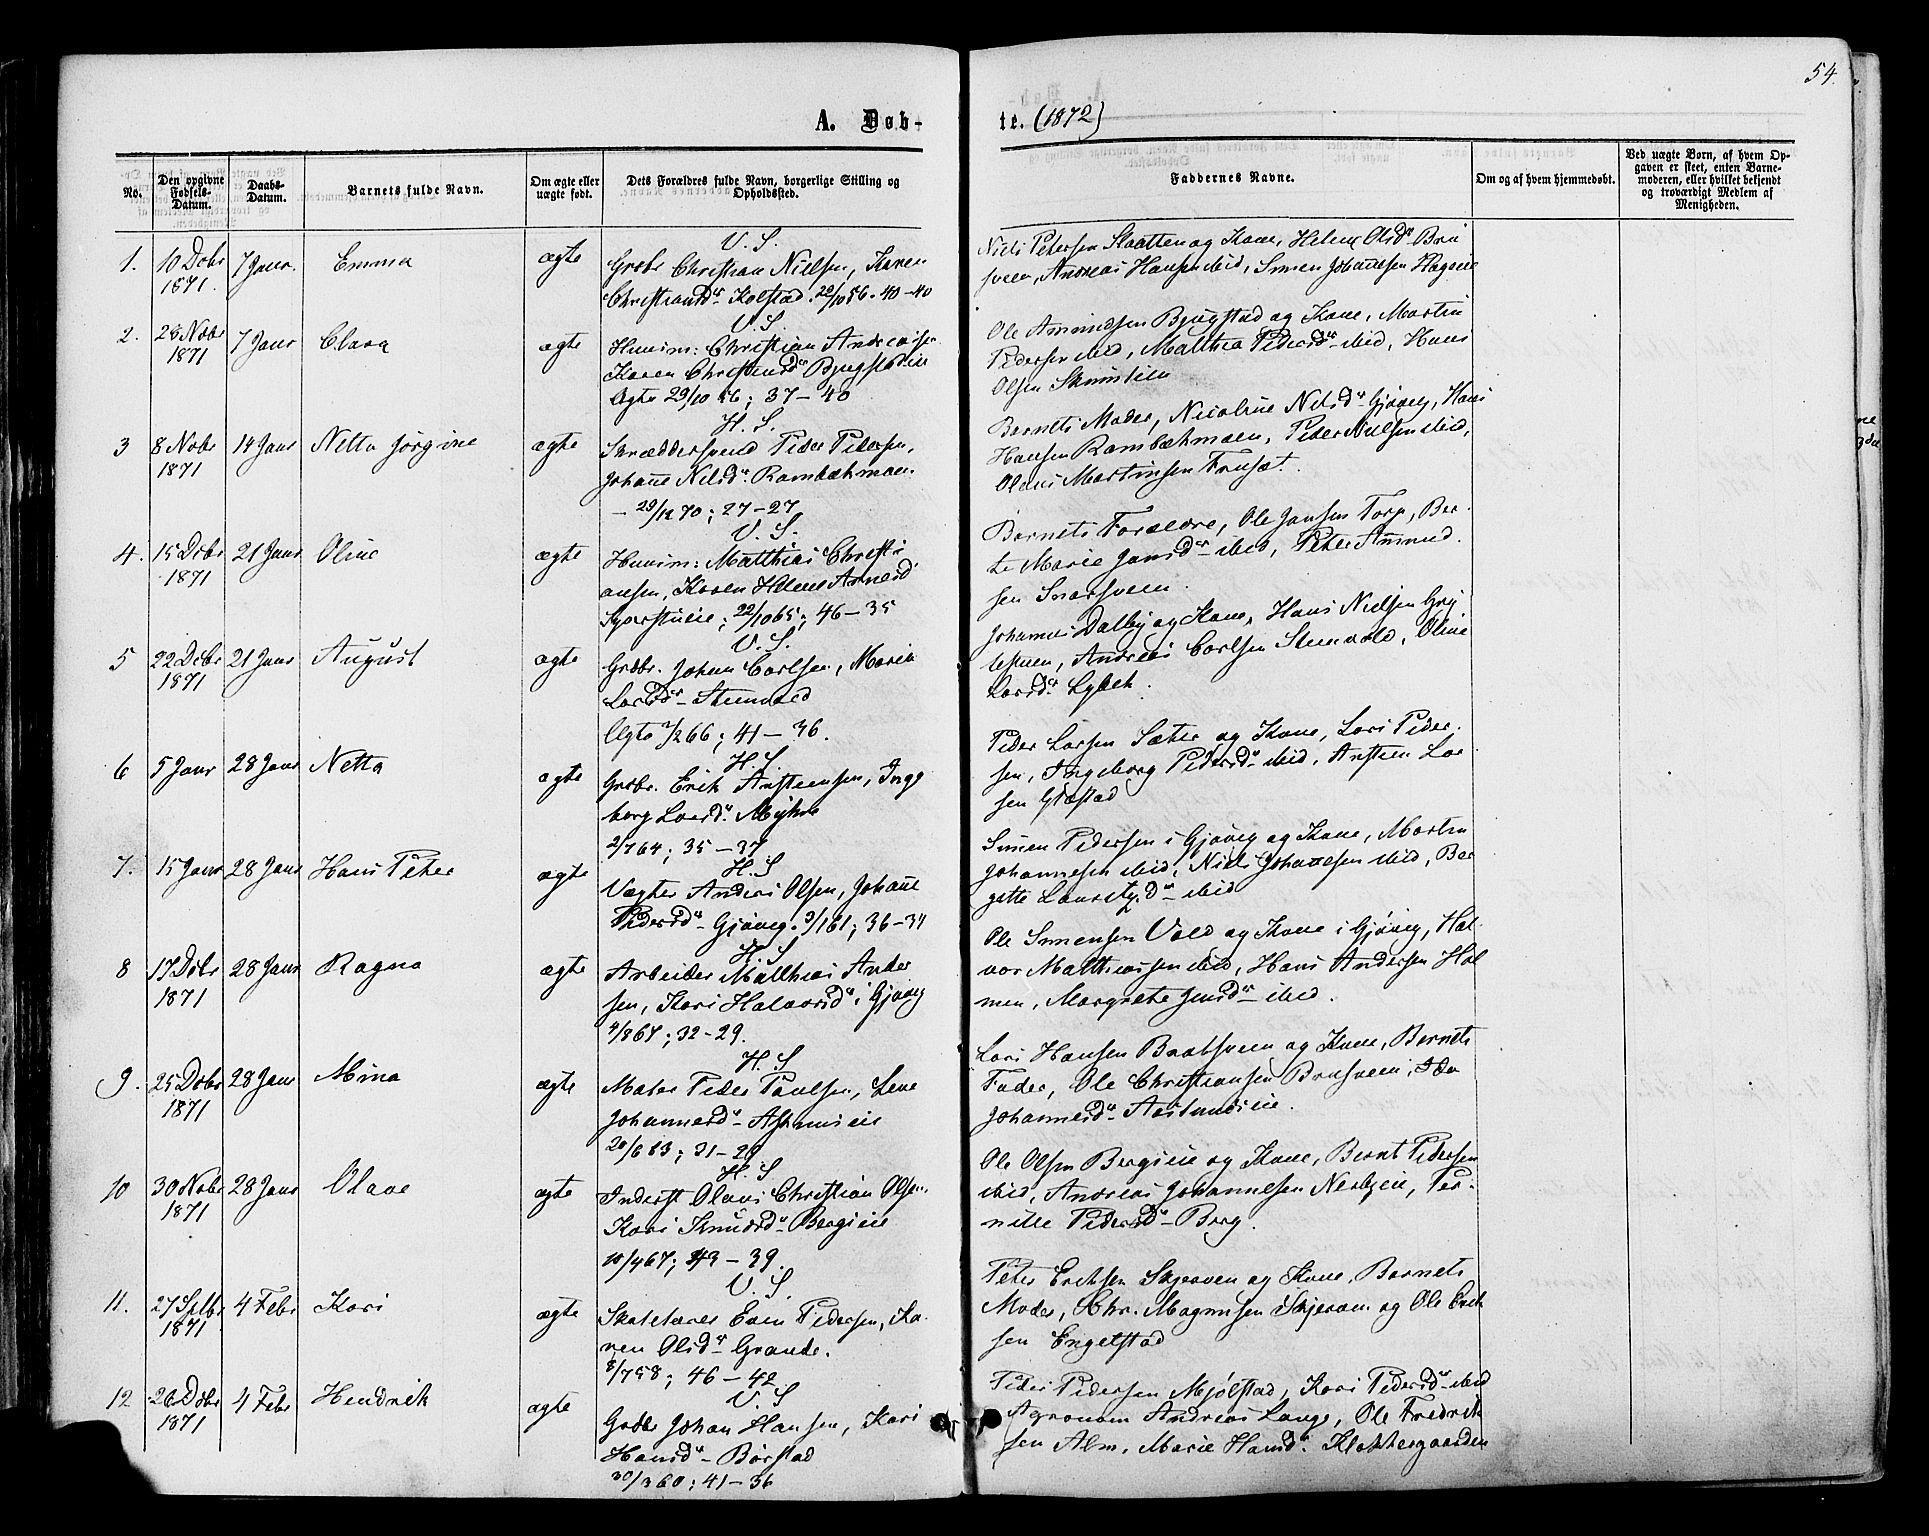 SAH, Vardal prestekontor, H/Ha/Haa/L0007: Ministerialbok nr. 7, 1867-1878, s. 54